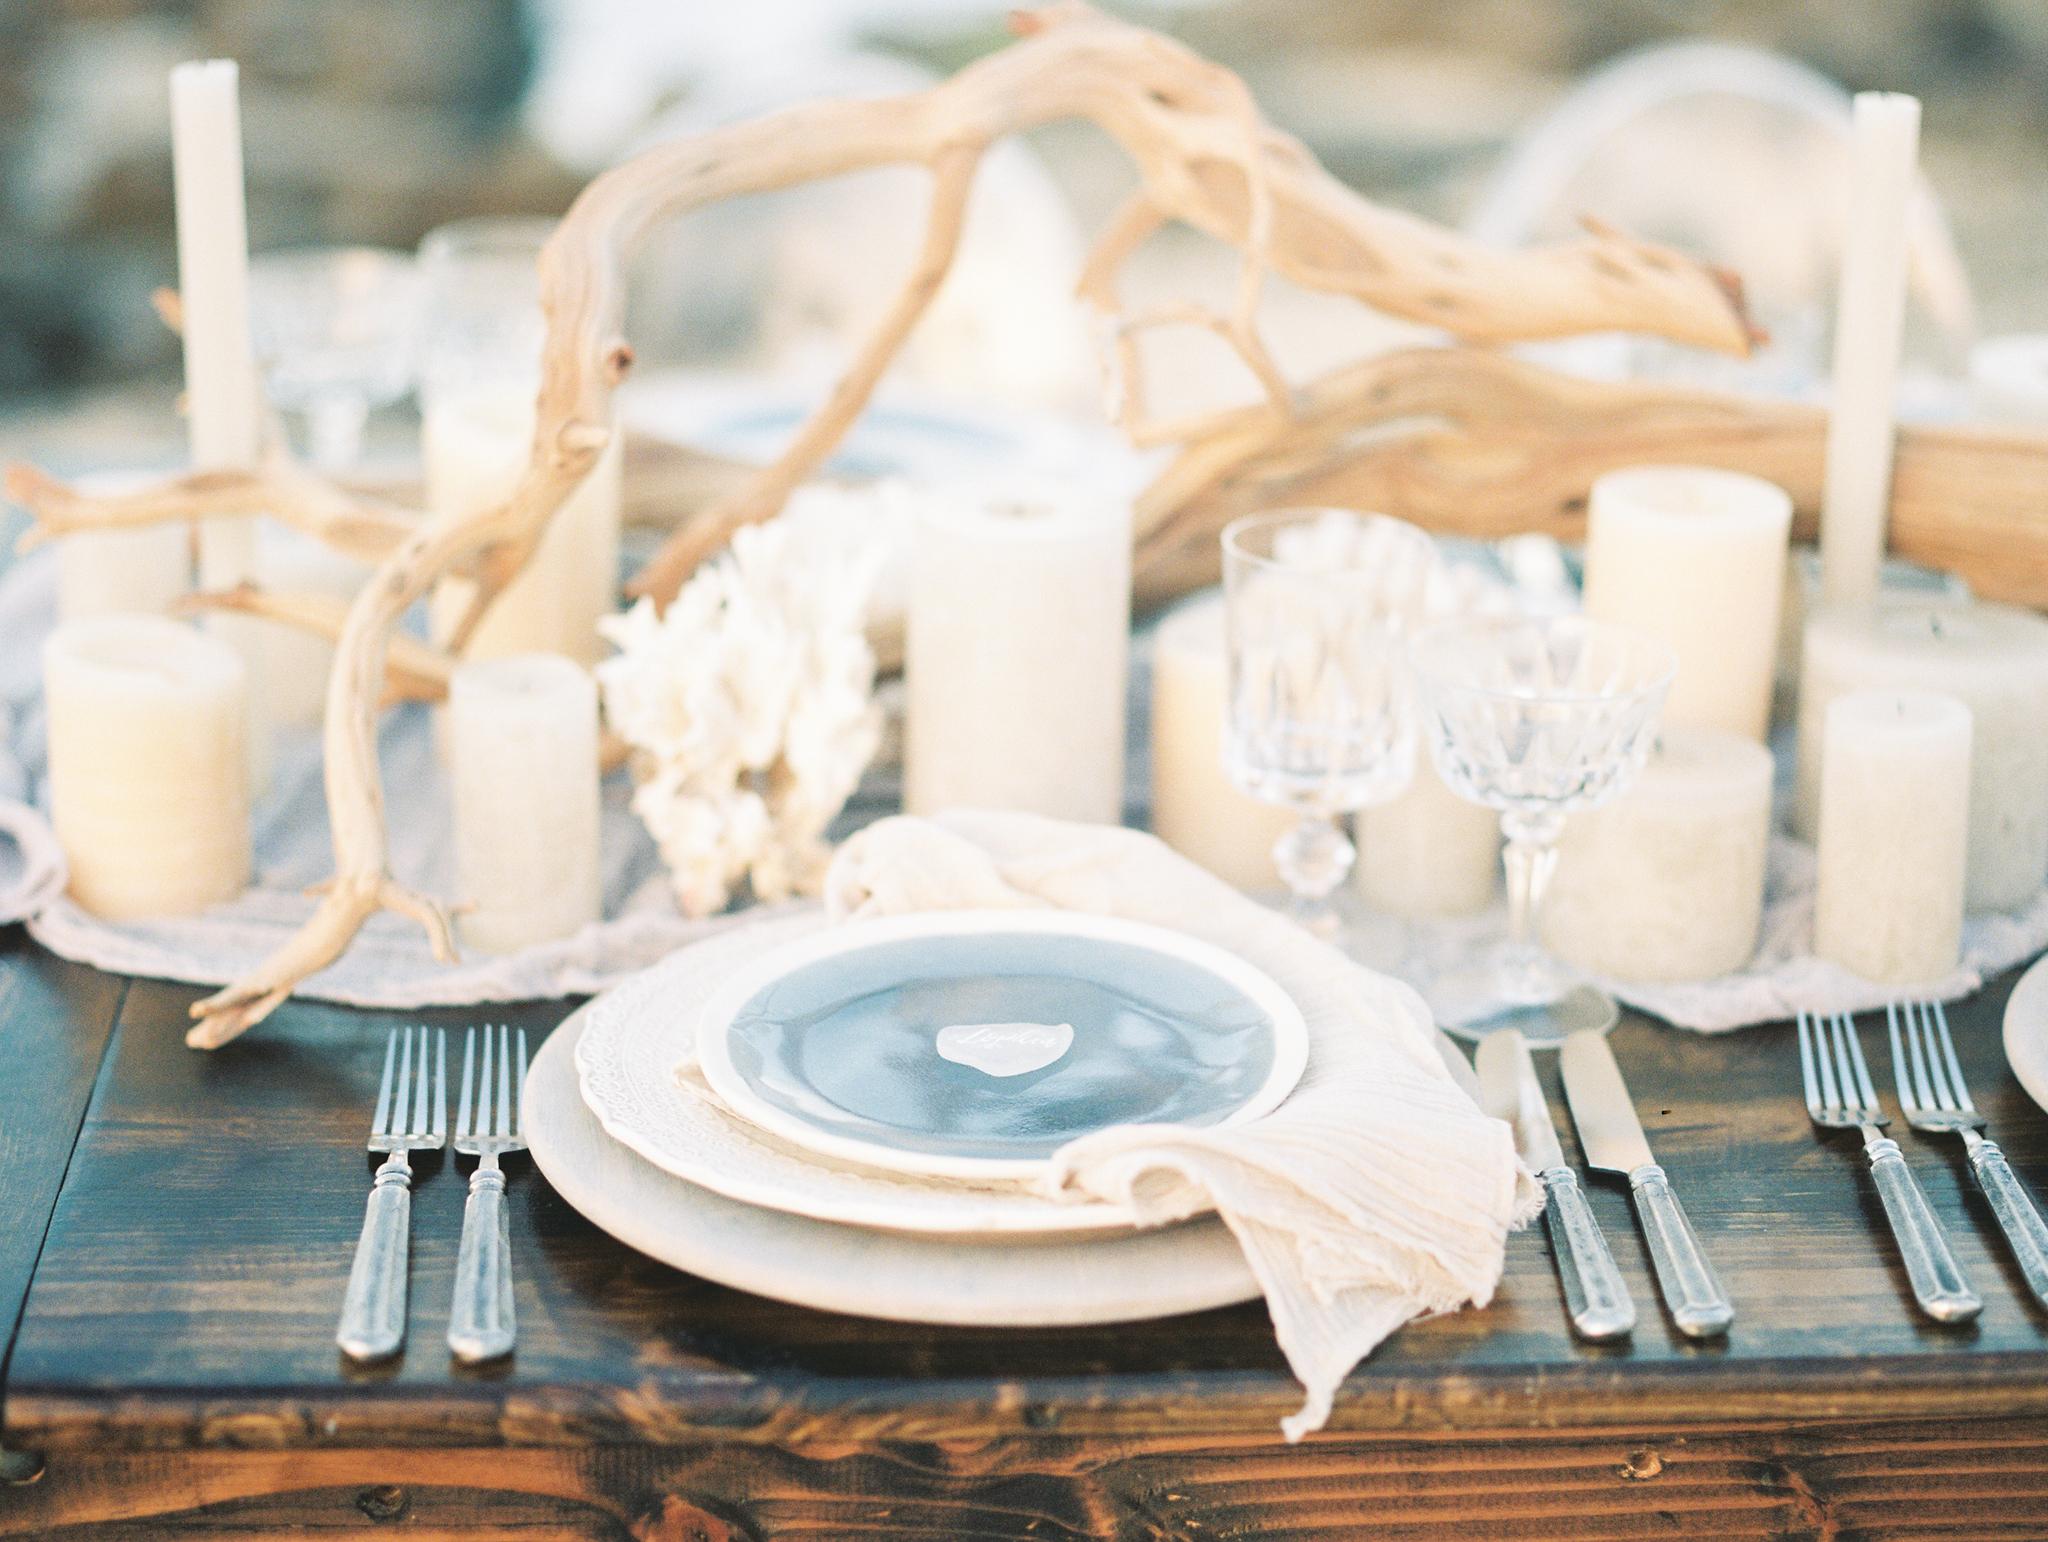 coral cove, jupiter beach FL, palm beach wedding photos, reception table